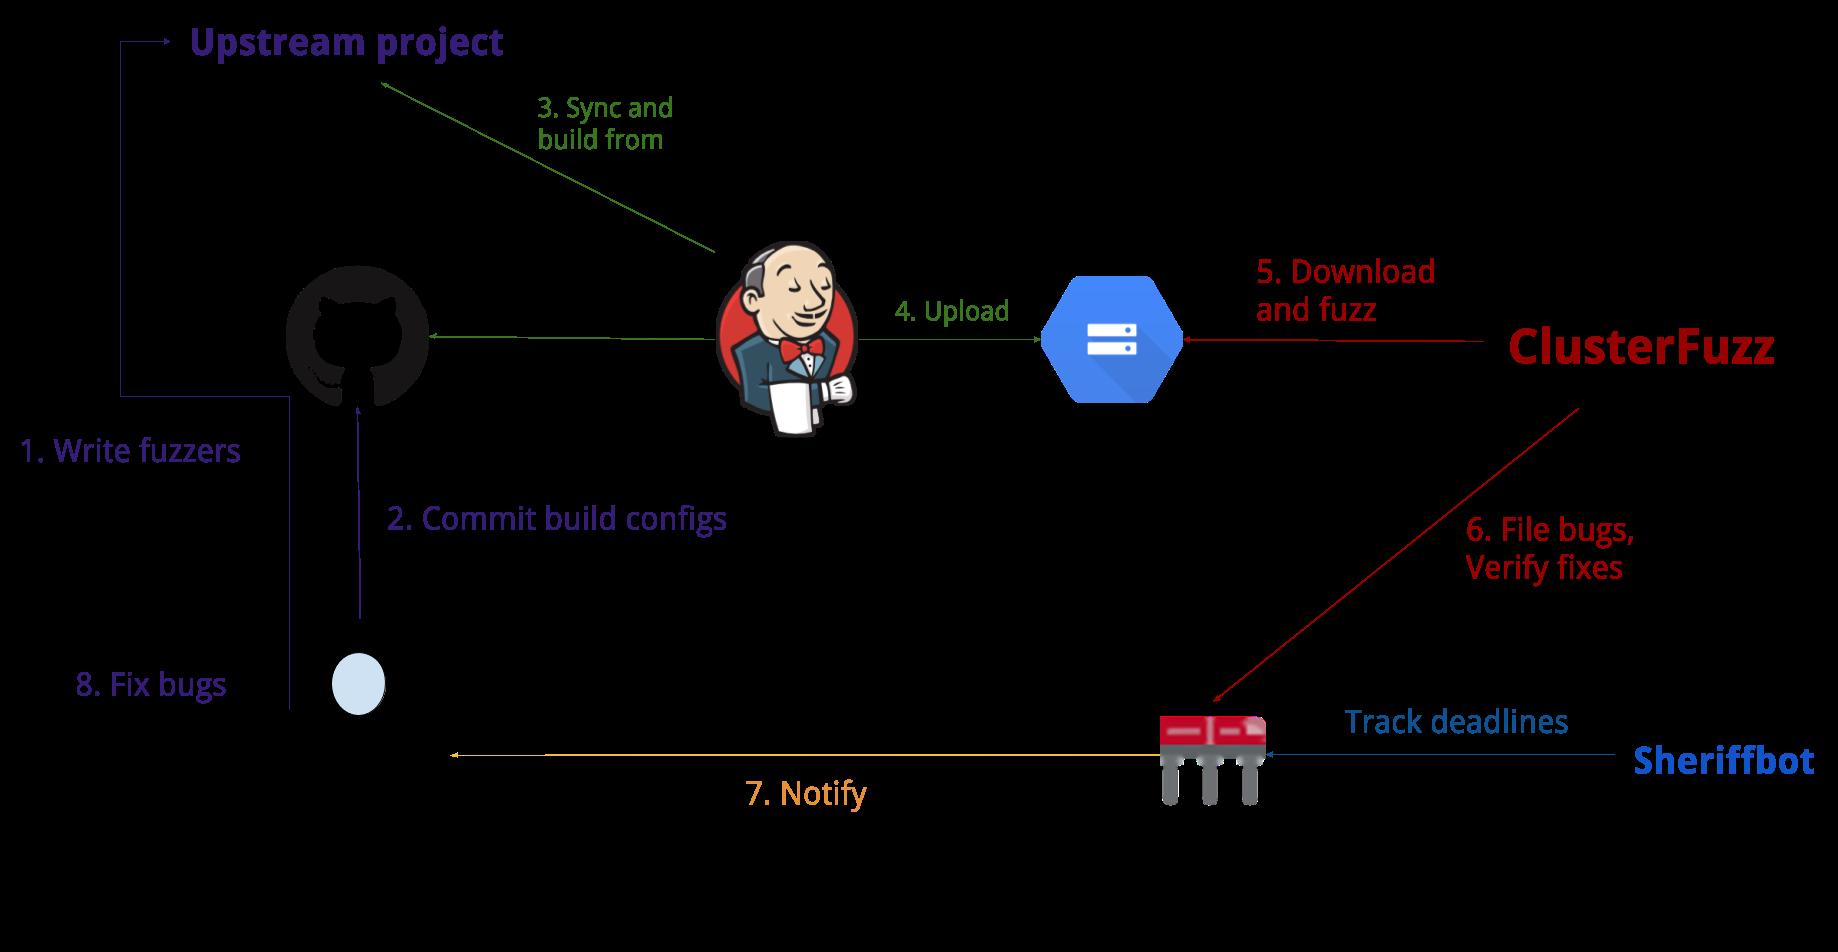 OSS-Fuzz Fuzzying Process